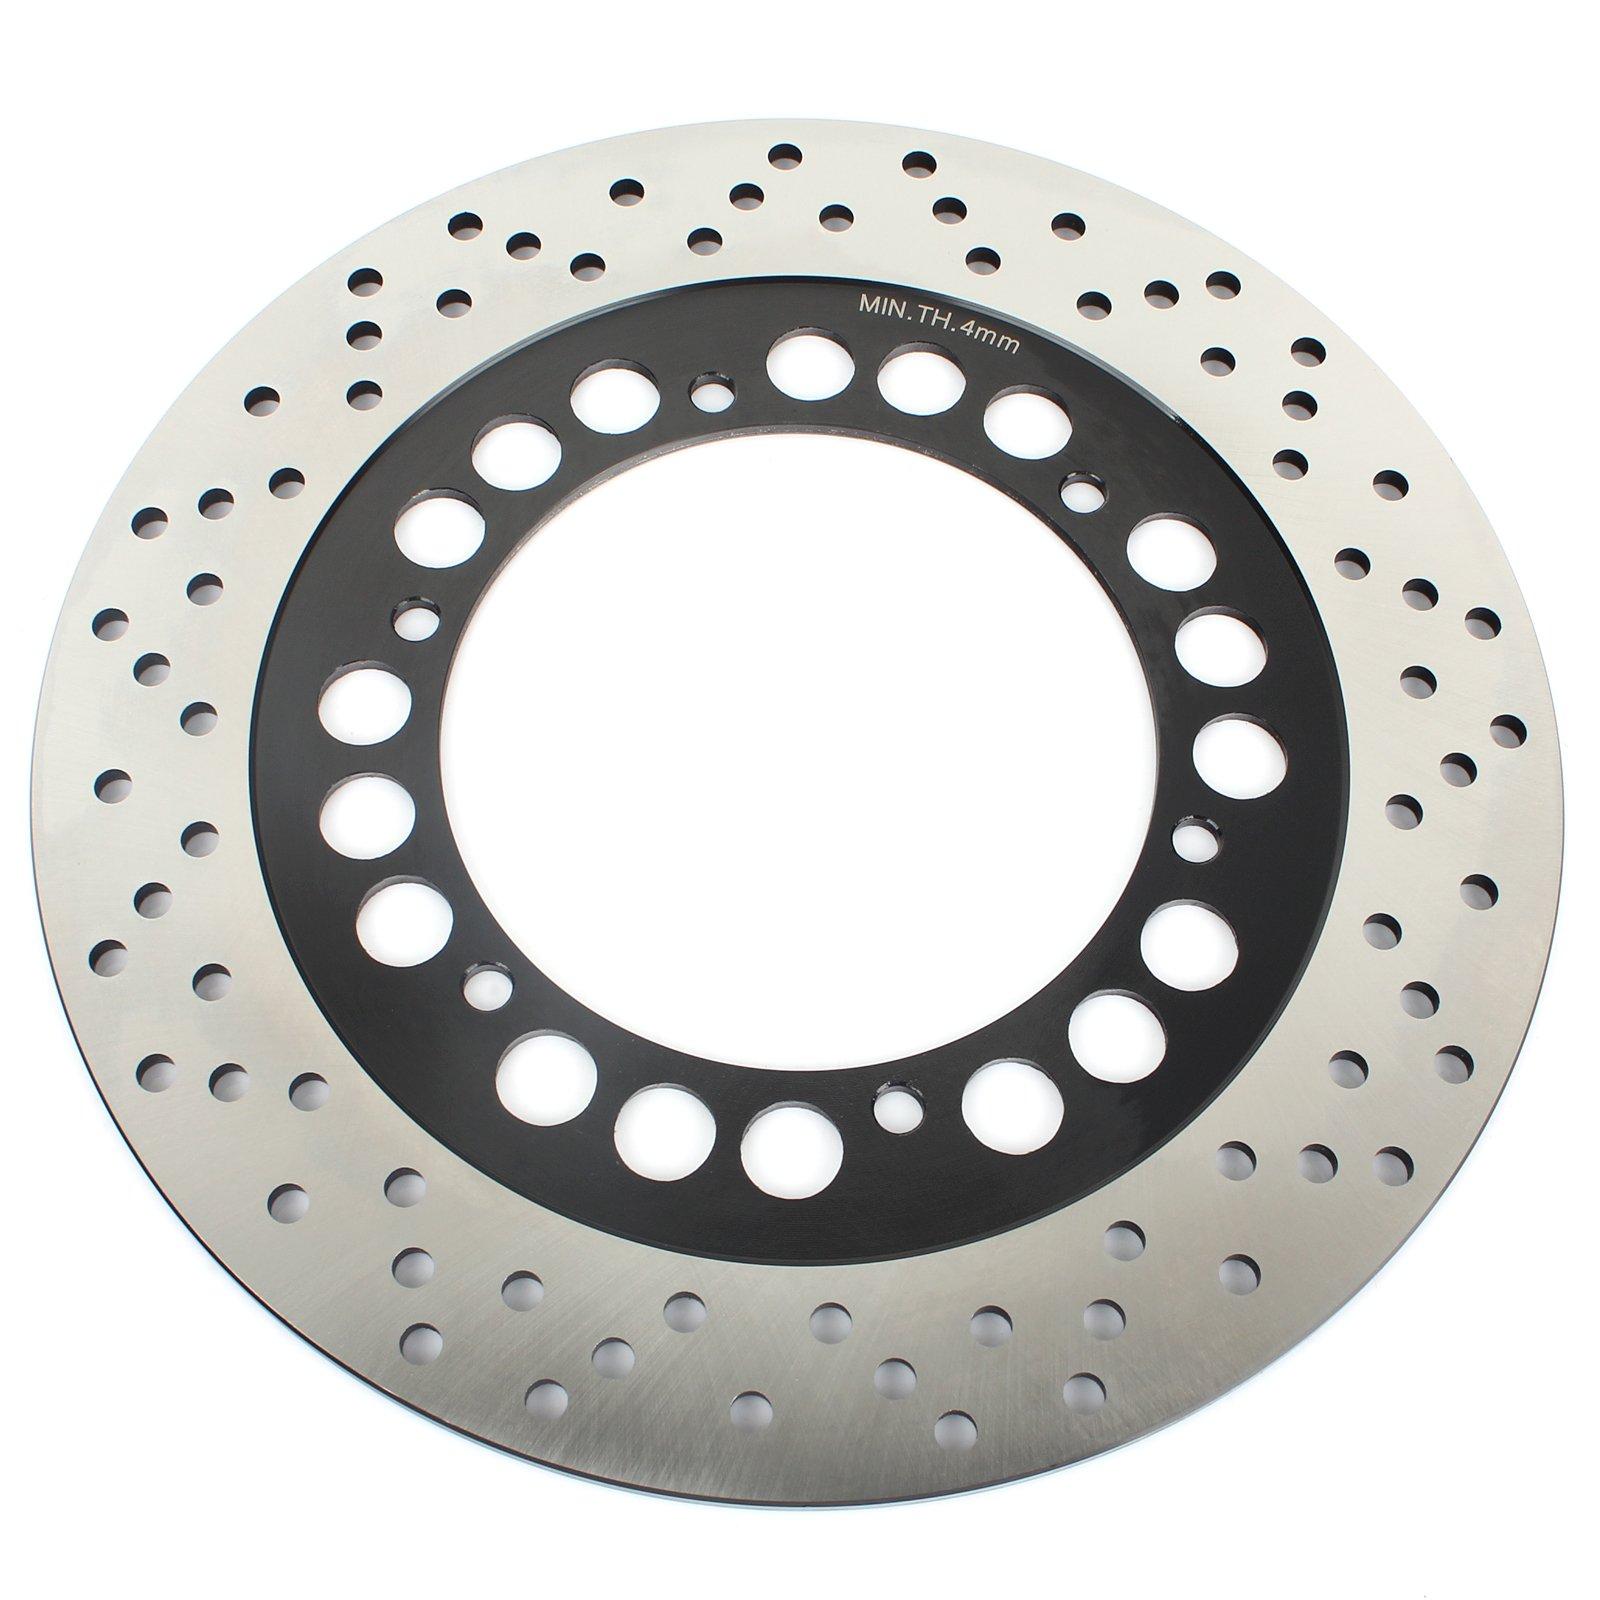 TARAZON Rear Brake Rotor Disc for Yamaha FJ1100 FJ1200 FJR1300 XVS1100 V-Star Classic XV1700 V Max VMX12 1200